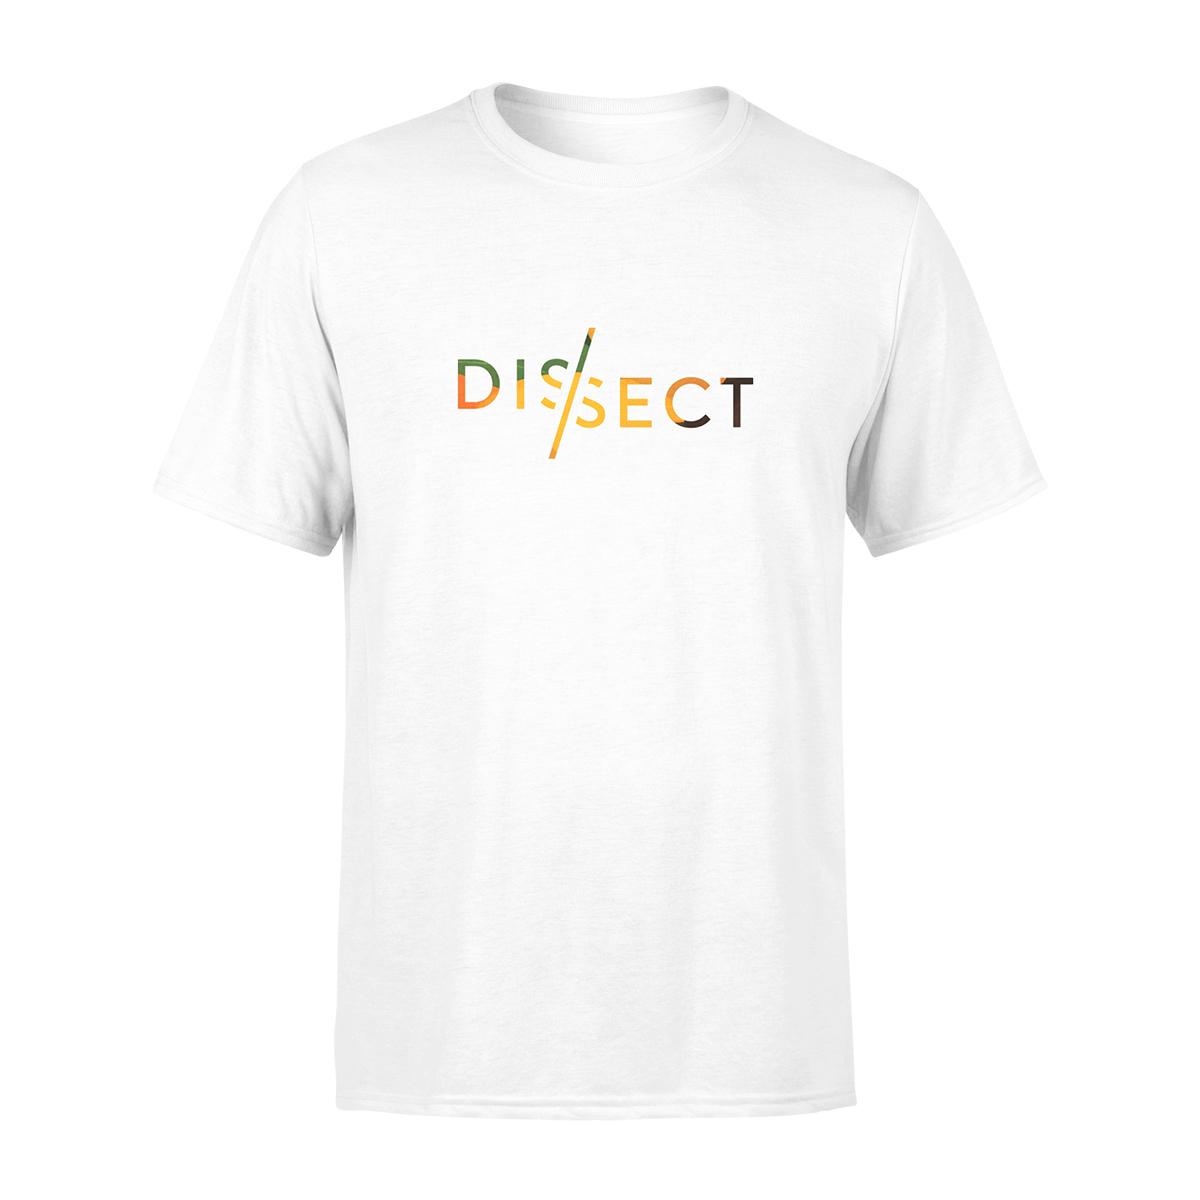 Limited Season 4 T-shirt